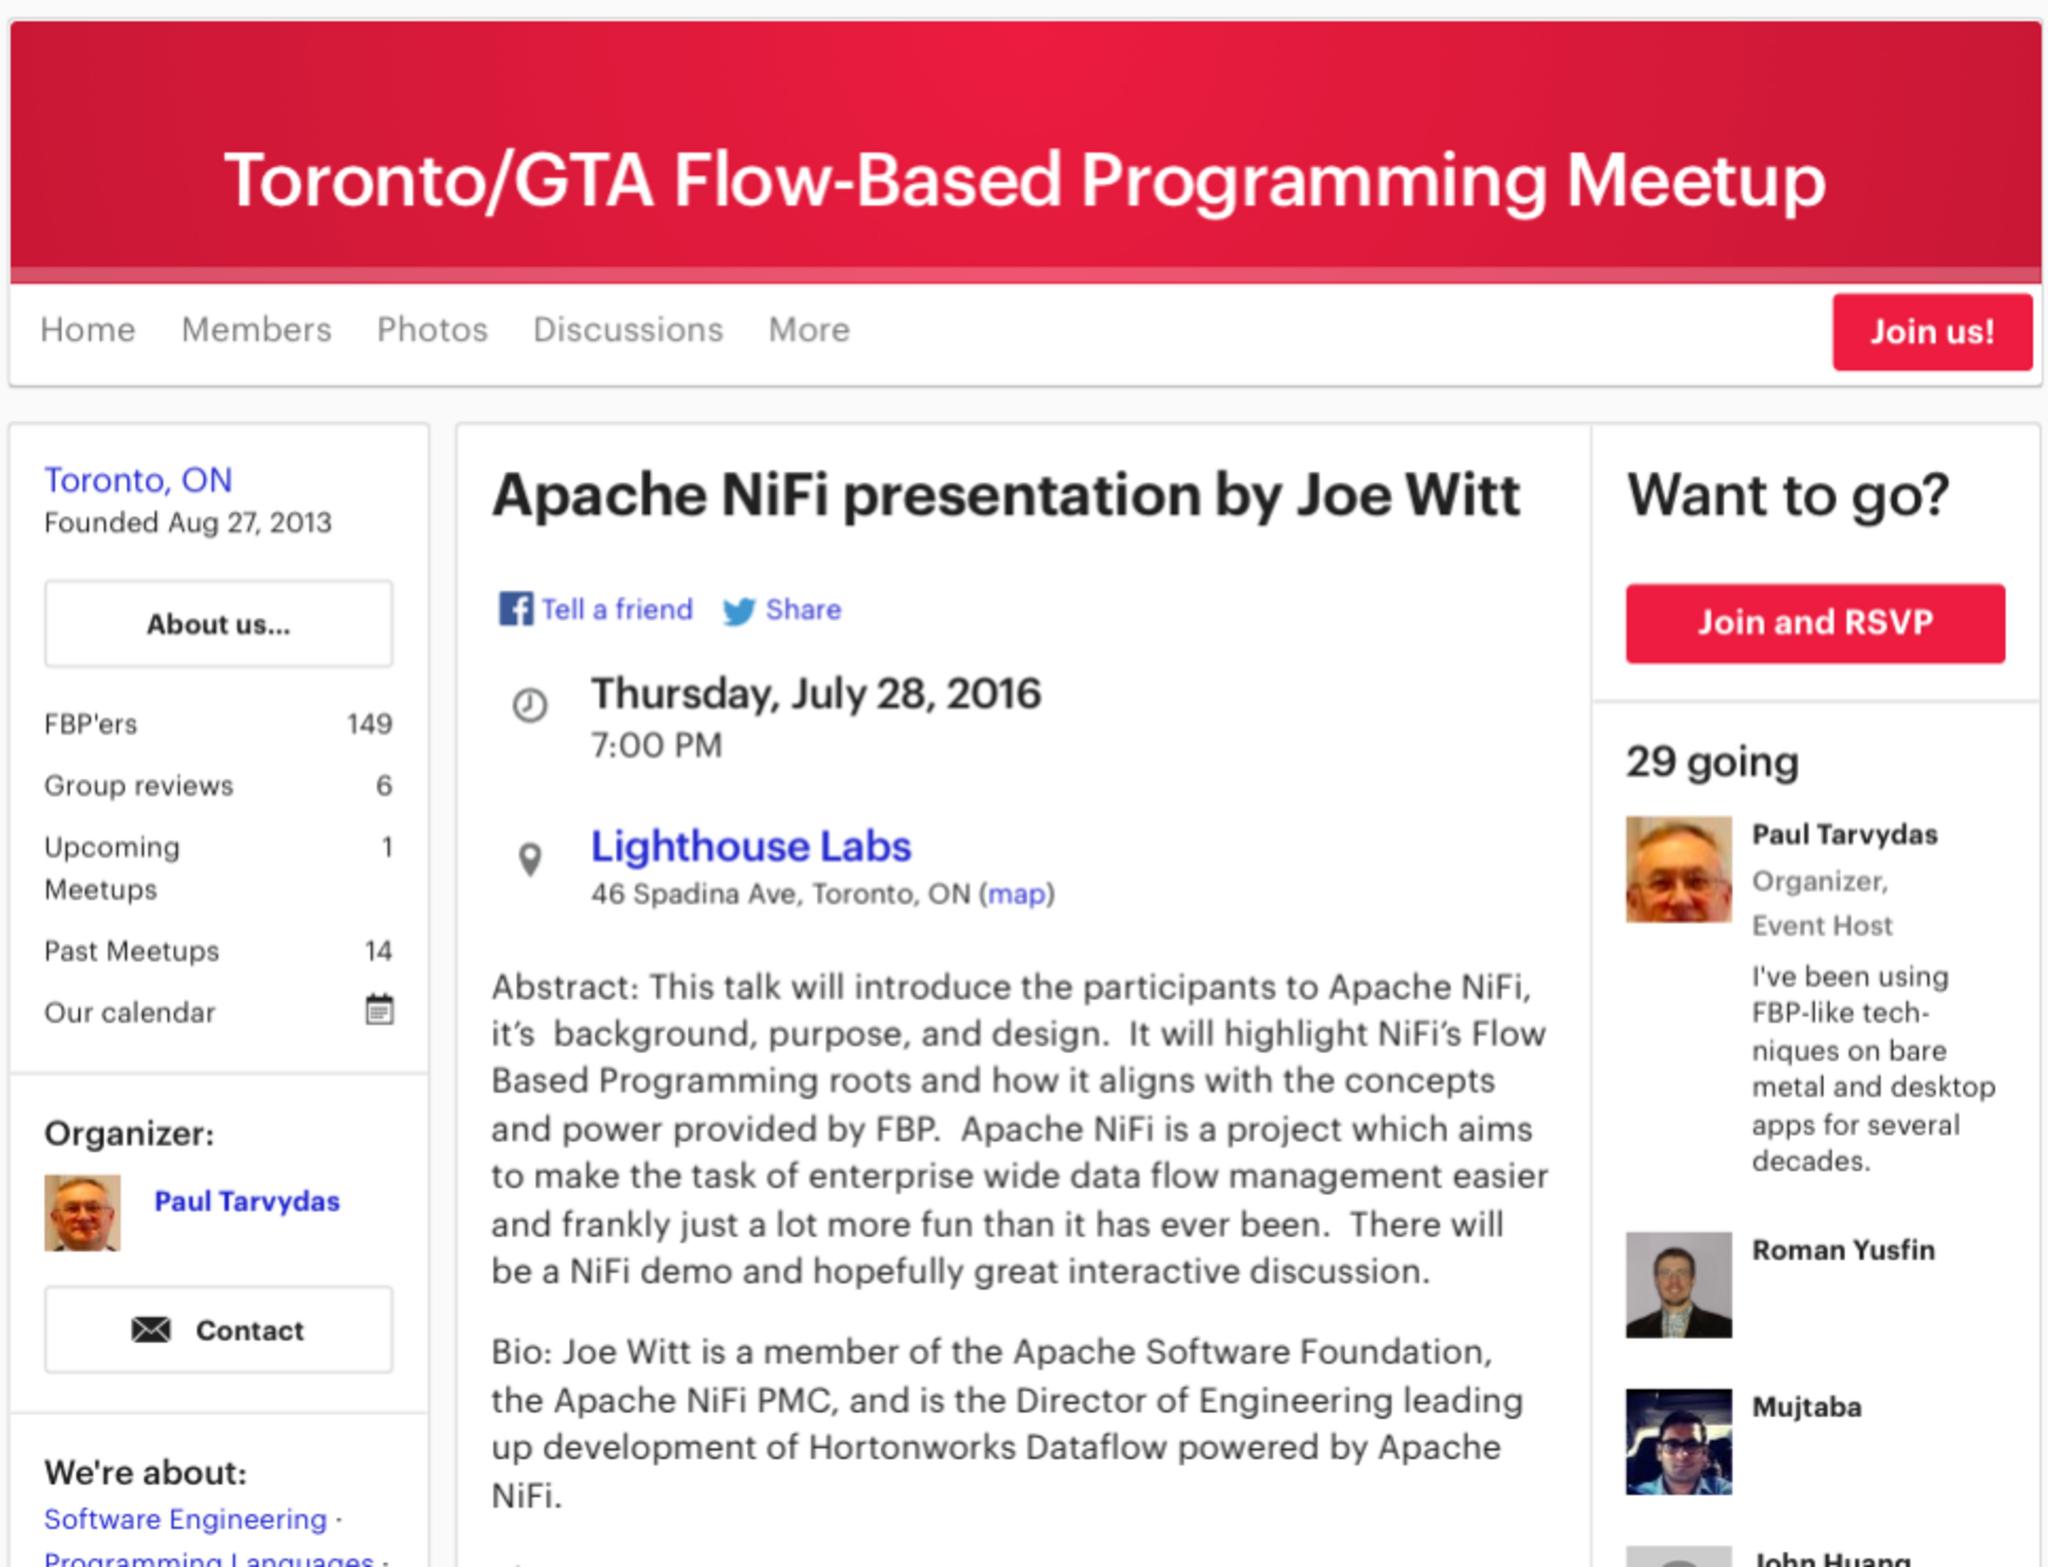 Apache NiFi IoT & Big Data Meetup - Meet the inventor!